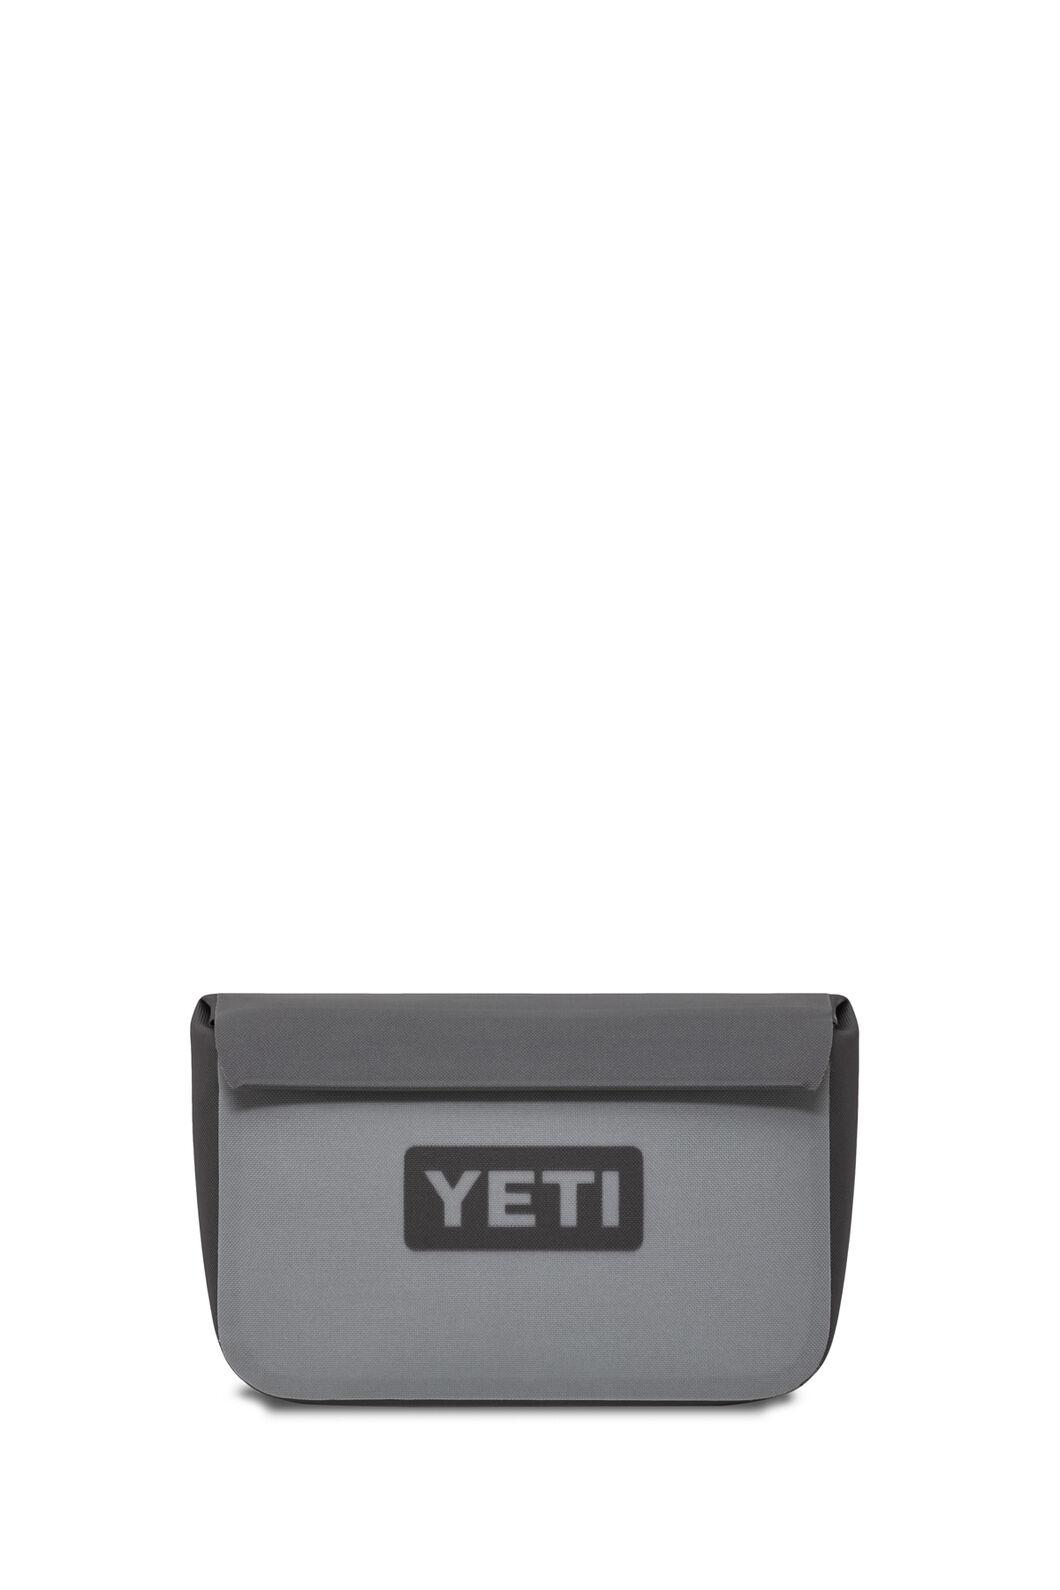 Yeti Hopper Sidekick Dry Soft Cooler, Fog Grey, hi-res